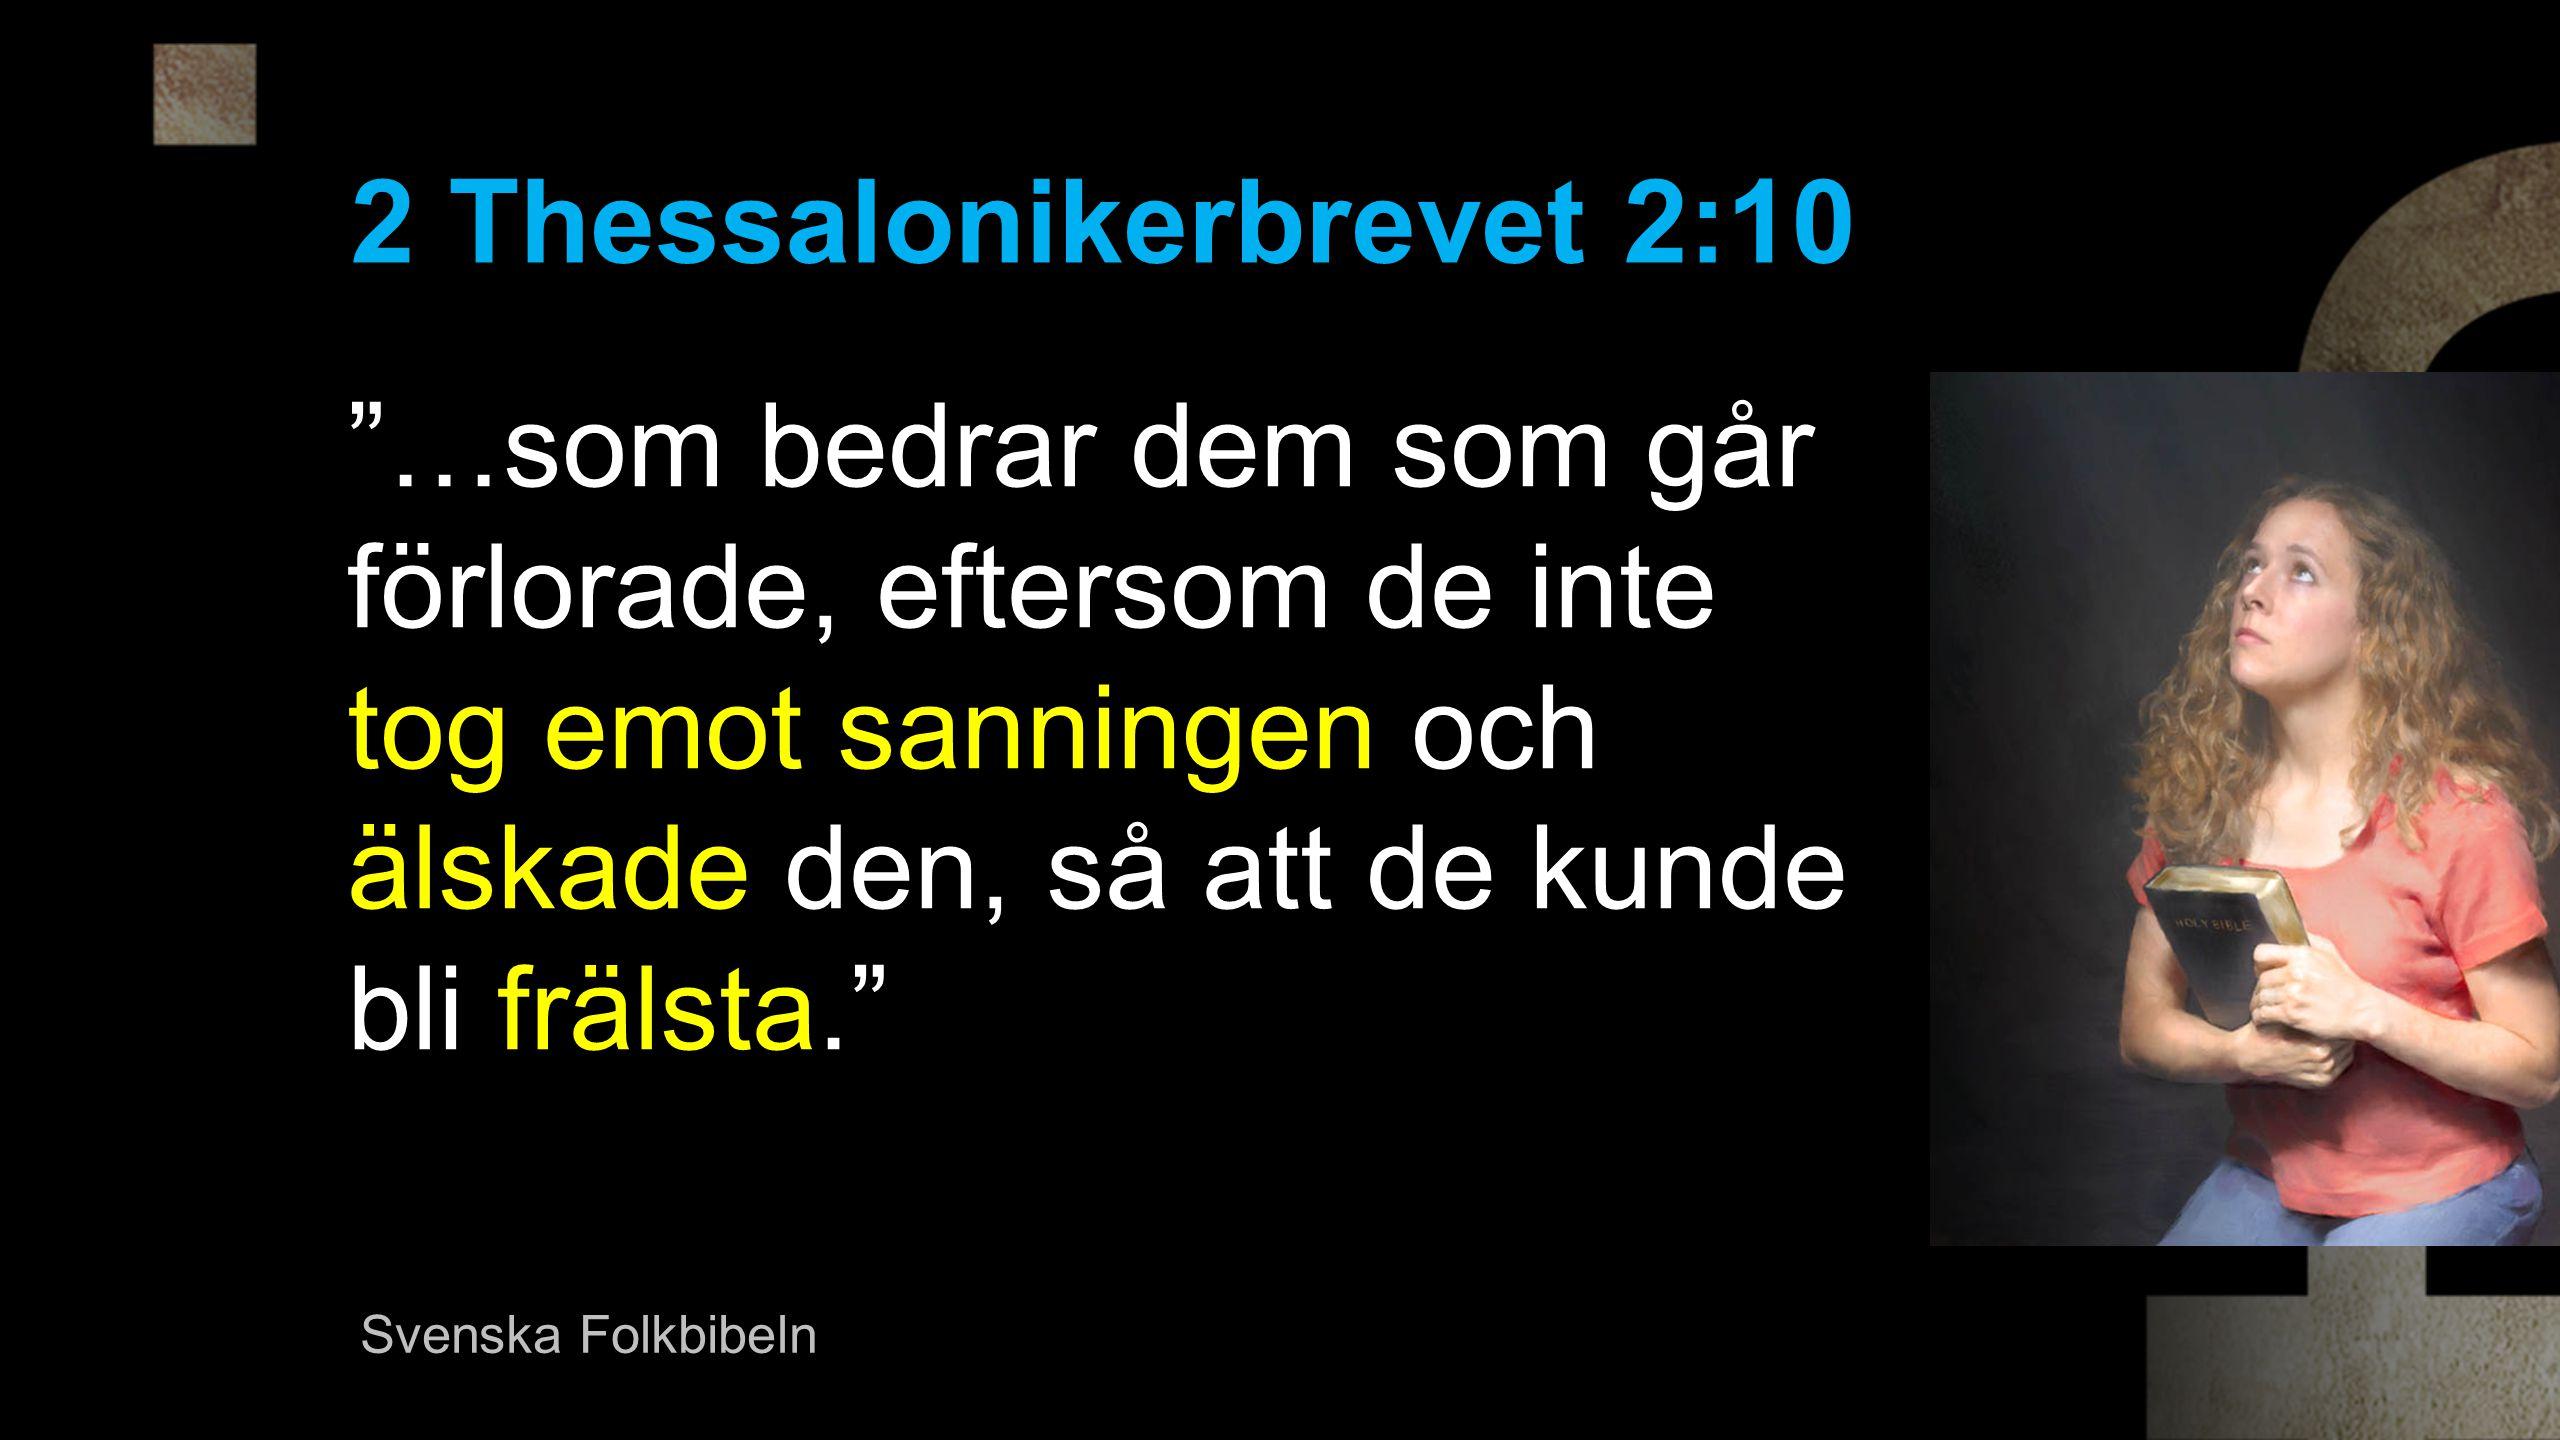 2 Thessalonikerbrevet 2:10